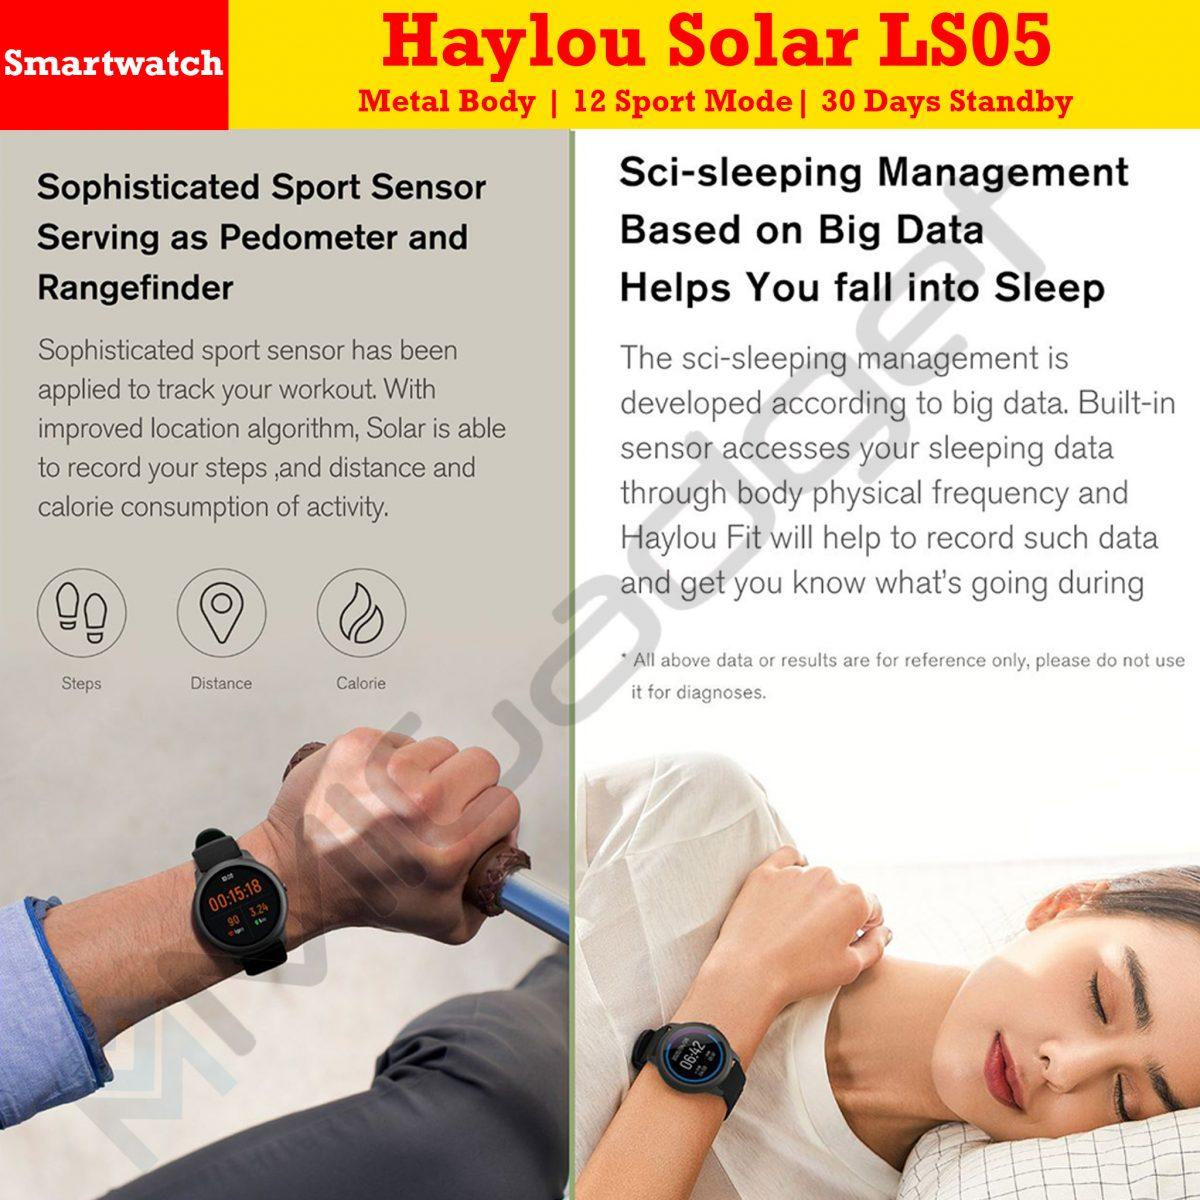 Haylou Solar LS05